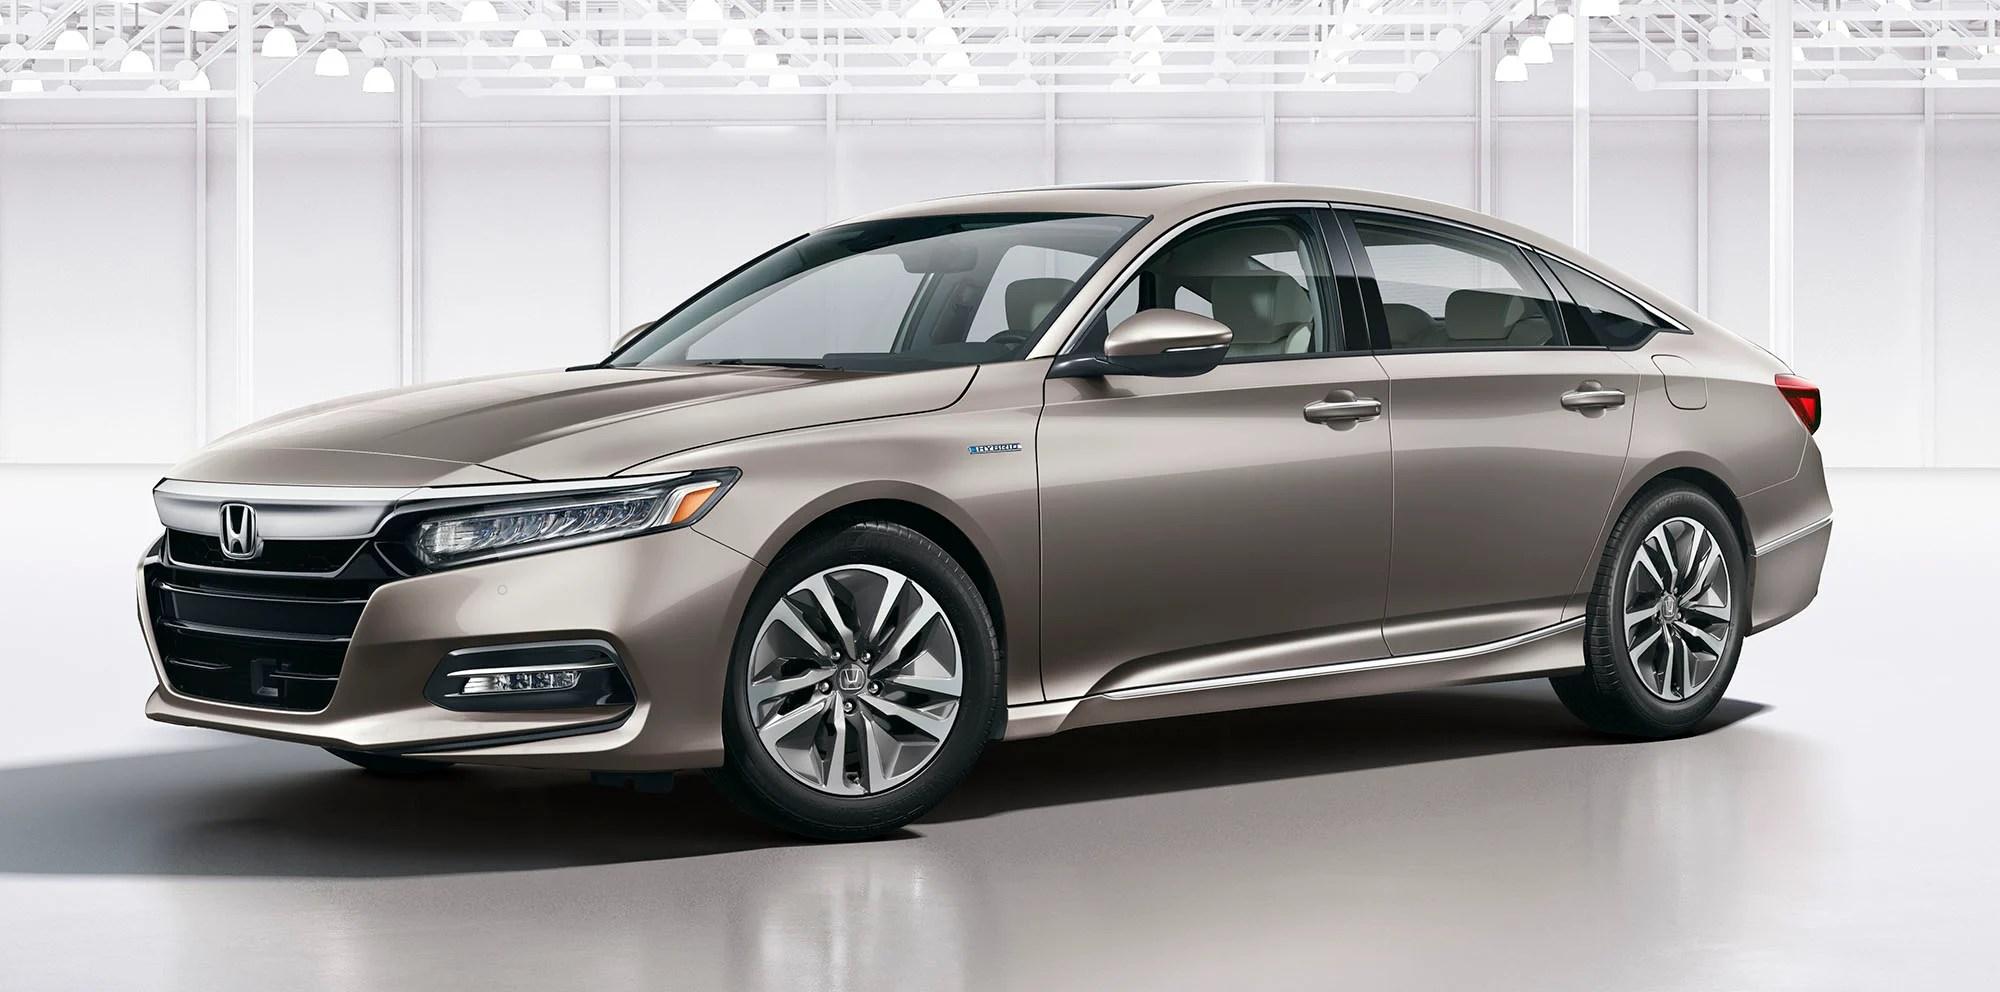 2018 Honda Accord Revealed 10th Gen Sedan Brings Turbo